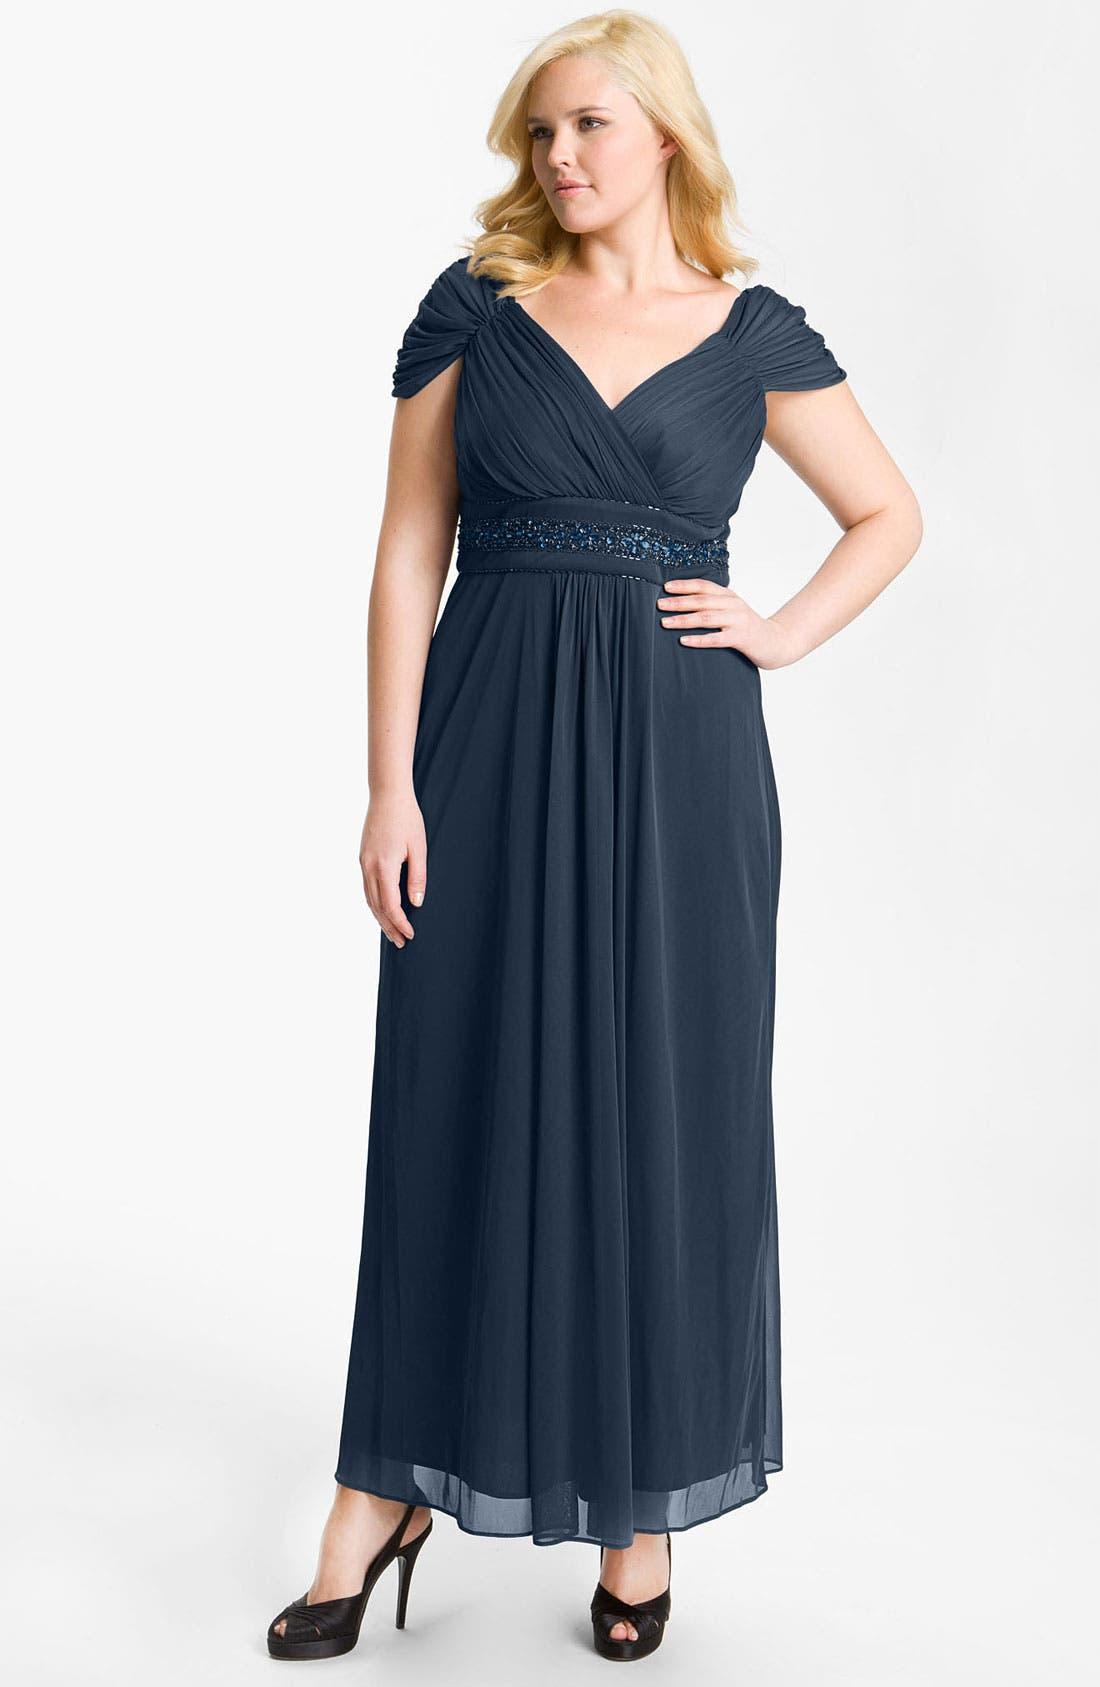 Alternate Image 1 Selected - Alex Evenings Beaded Cap Sleeve Mesh Dress (Plus)